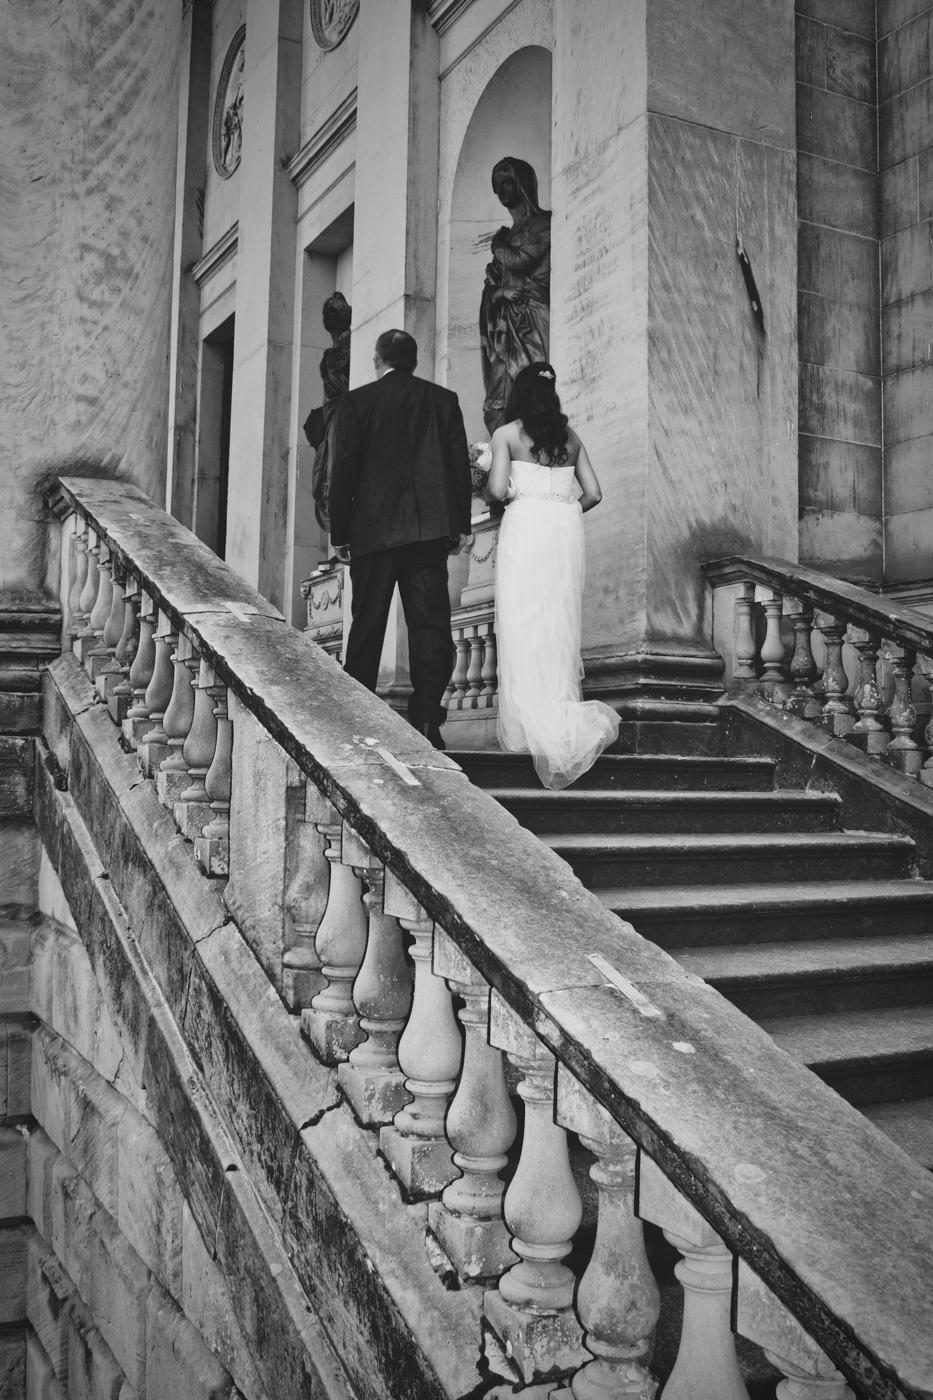 045 - Abi and Chris at Kedleston Hall - Wedding Photography by Mark Pugh www.markpugh.com - 5294.JPG